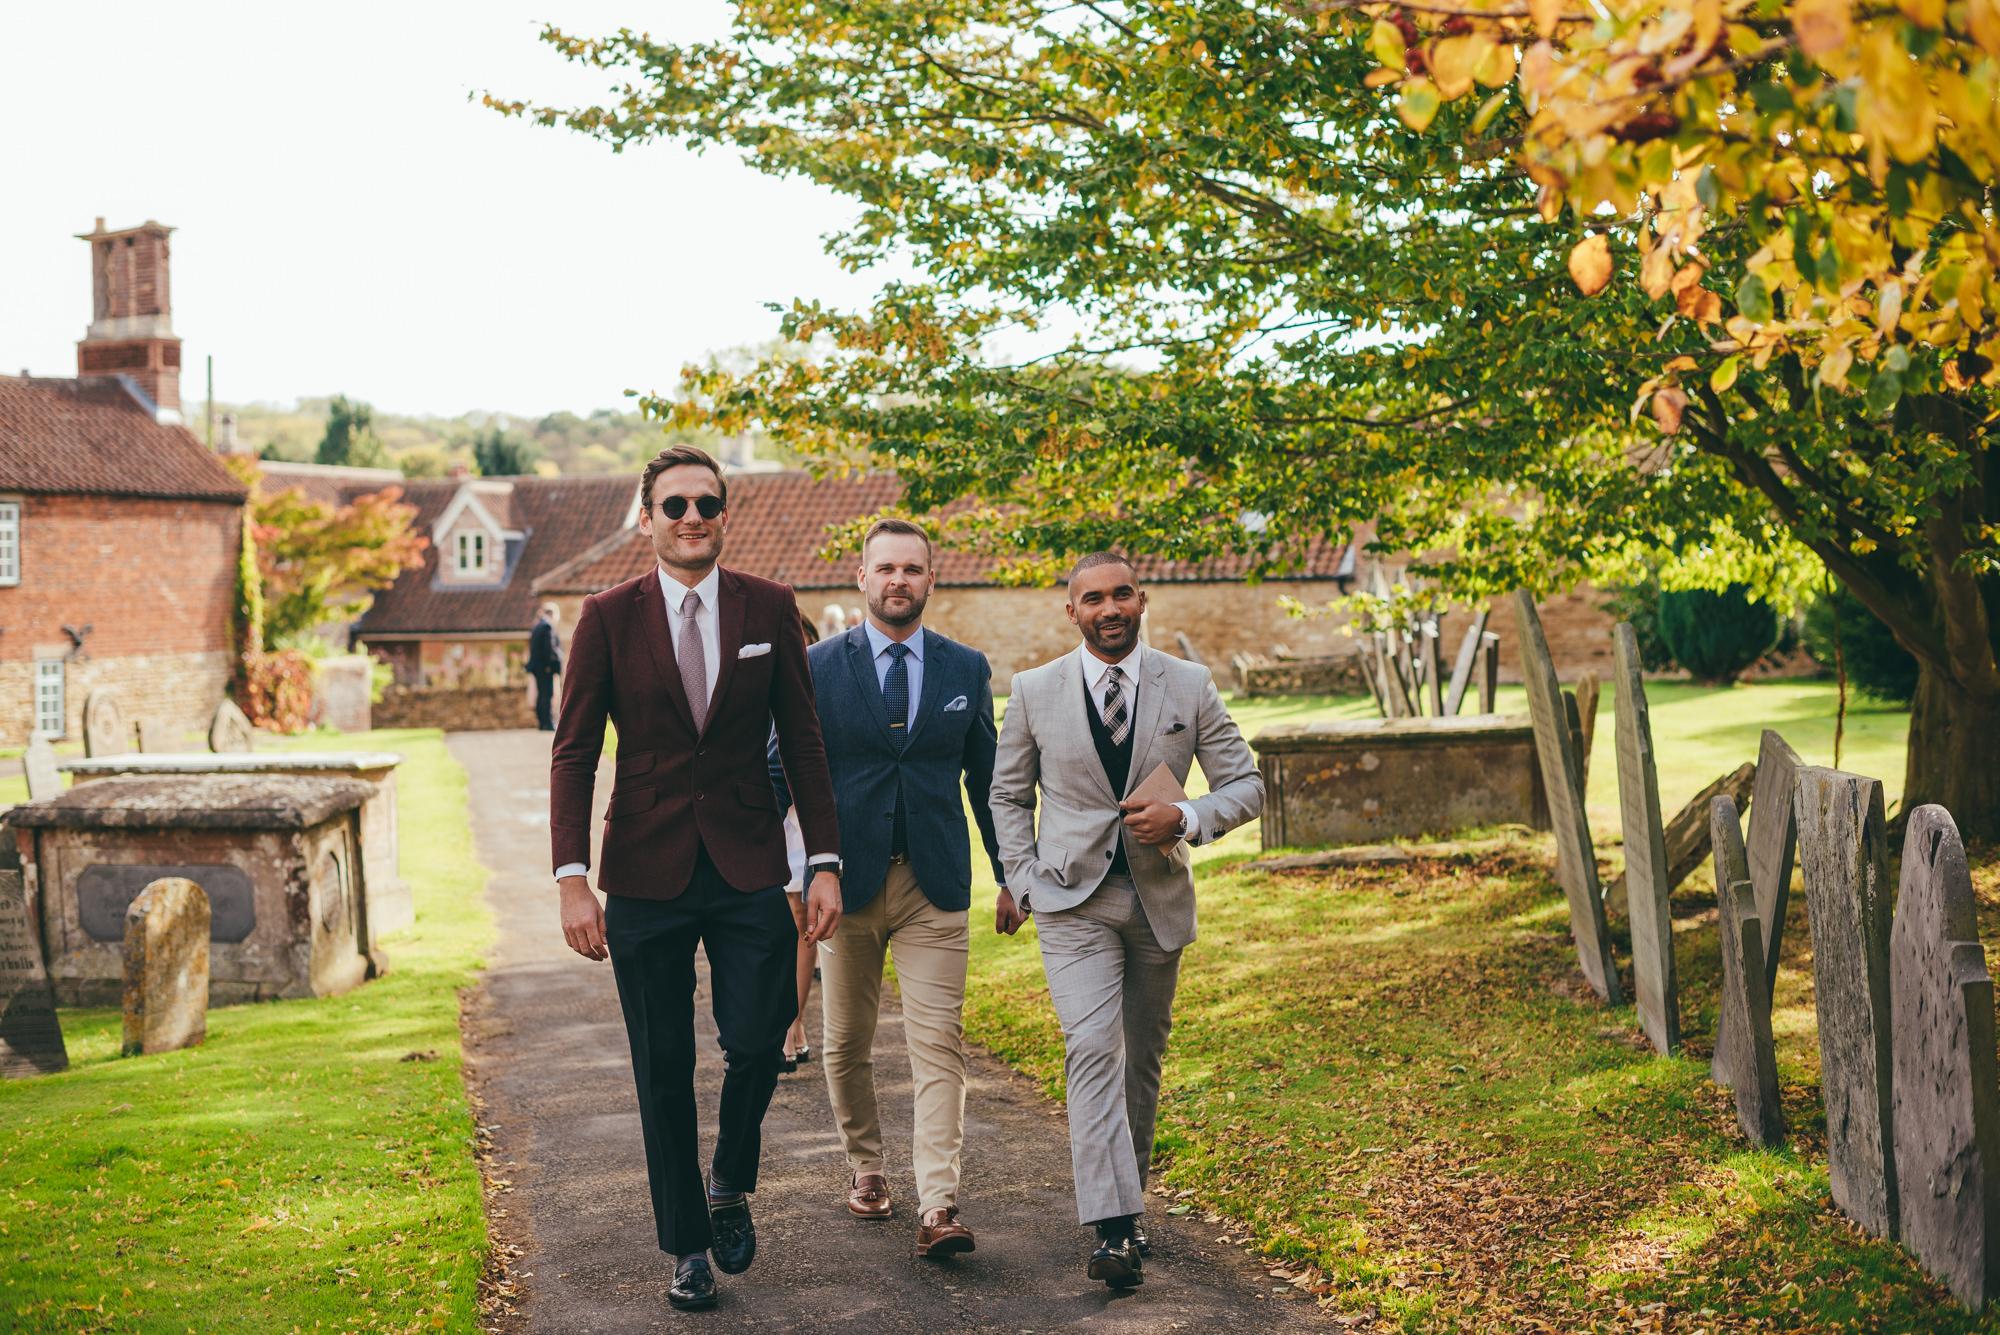 wedding guests arriving